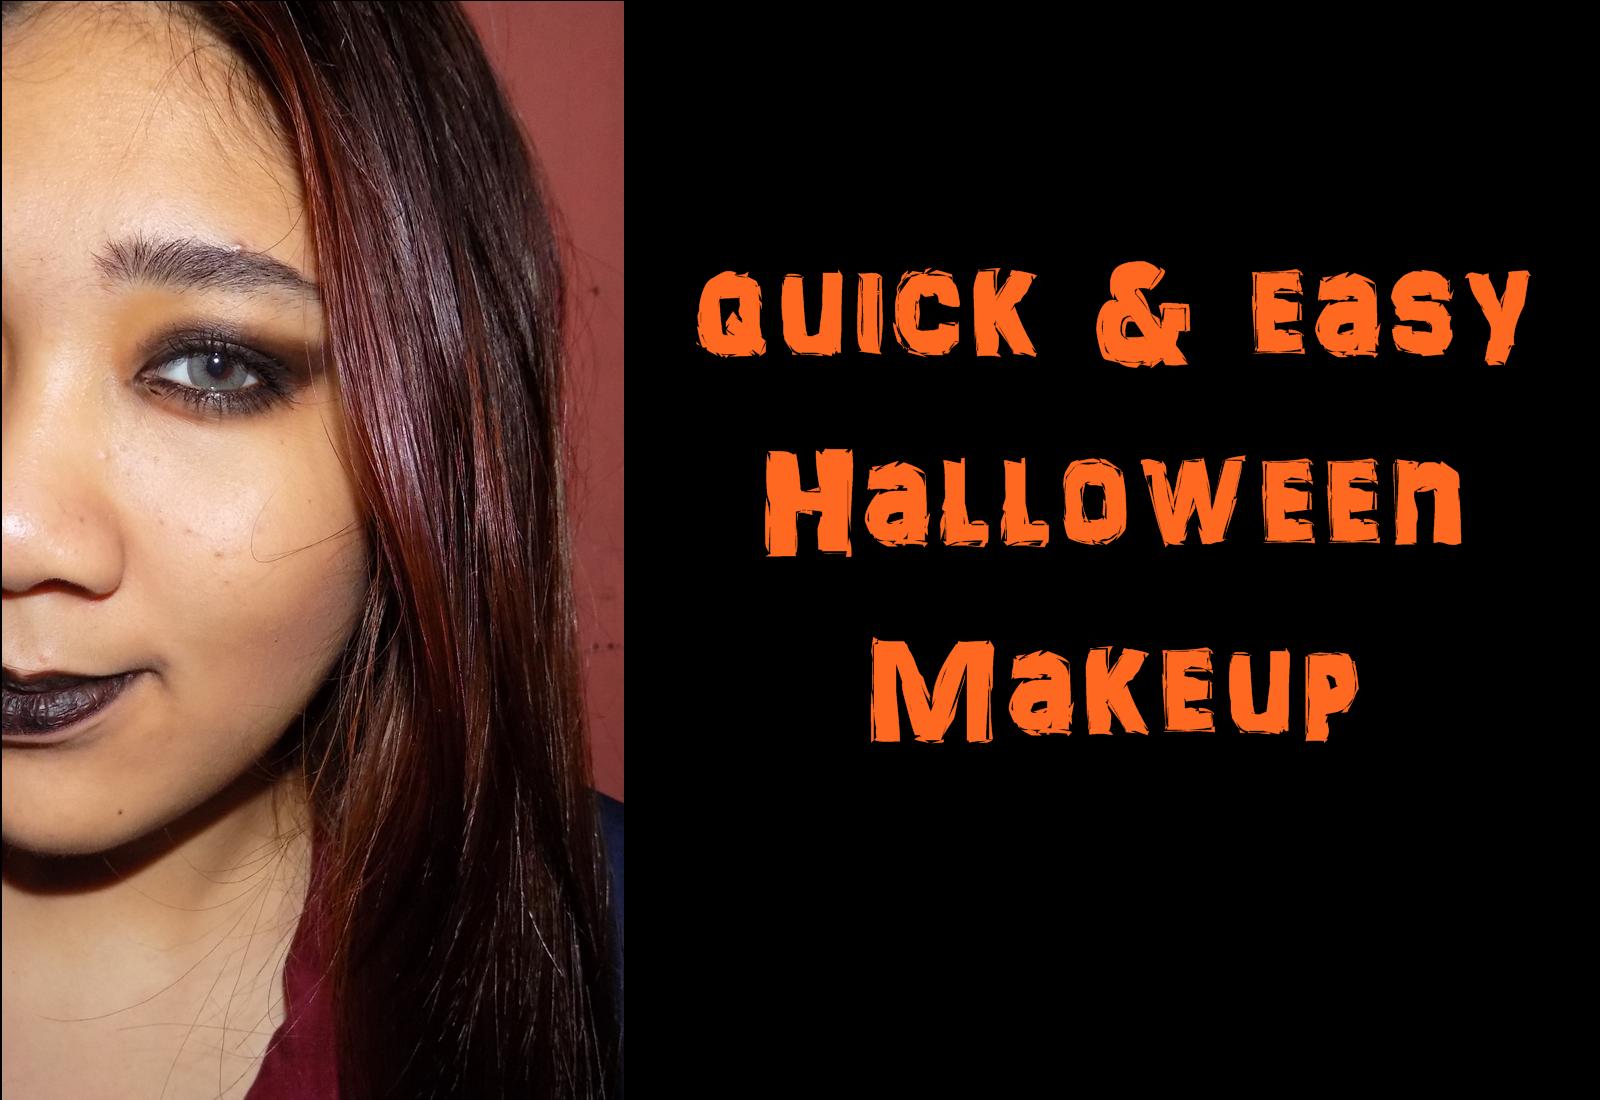 Witch Halloween Makeup Easy.Ey Es Gie By Sharleen Garcia Last Minute Halloween Makeup